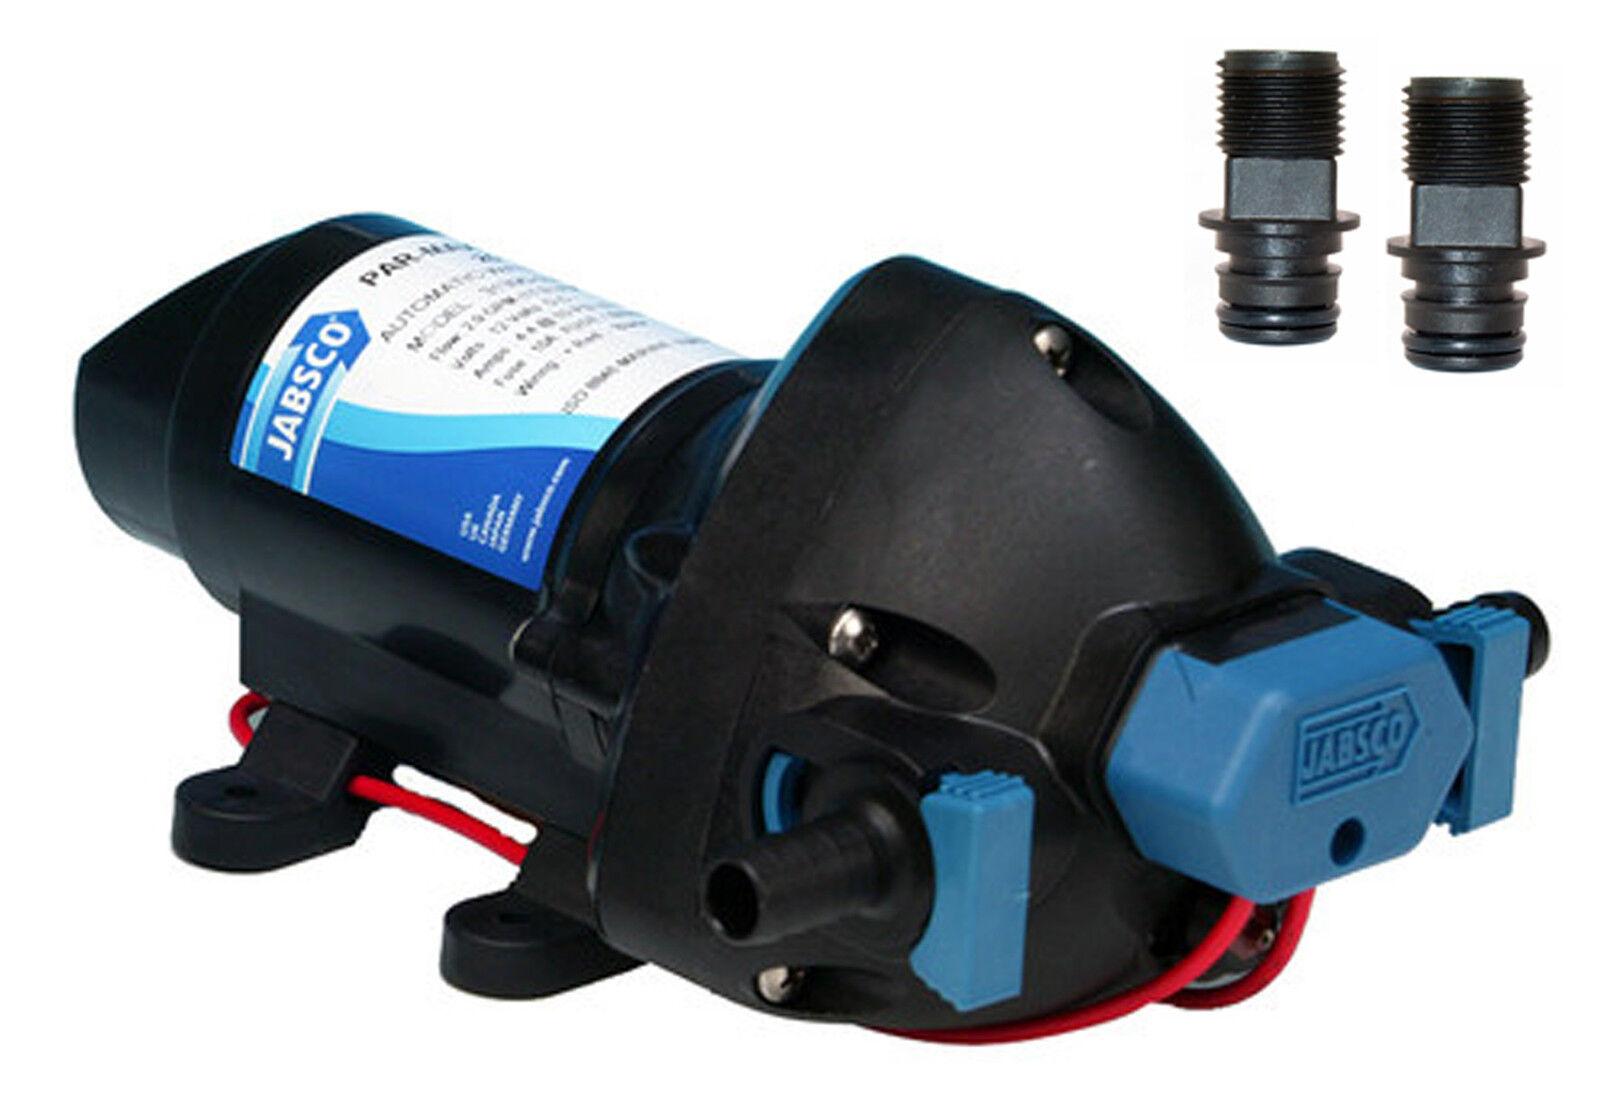 Jabsco PAR 12V MAX 2.9 Automatik Wasserpumpe 12V PAR 31395-0292 b543d3